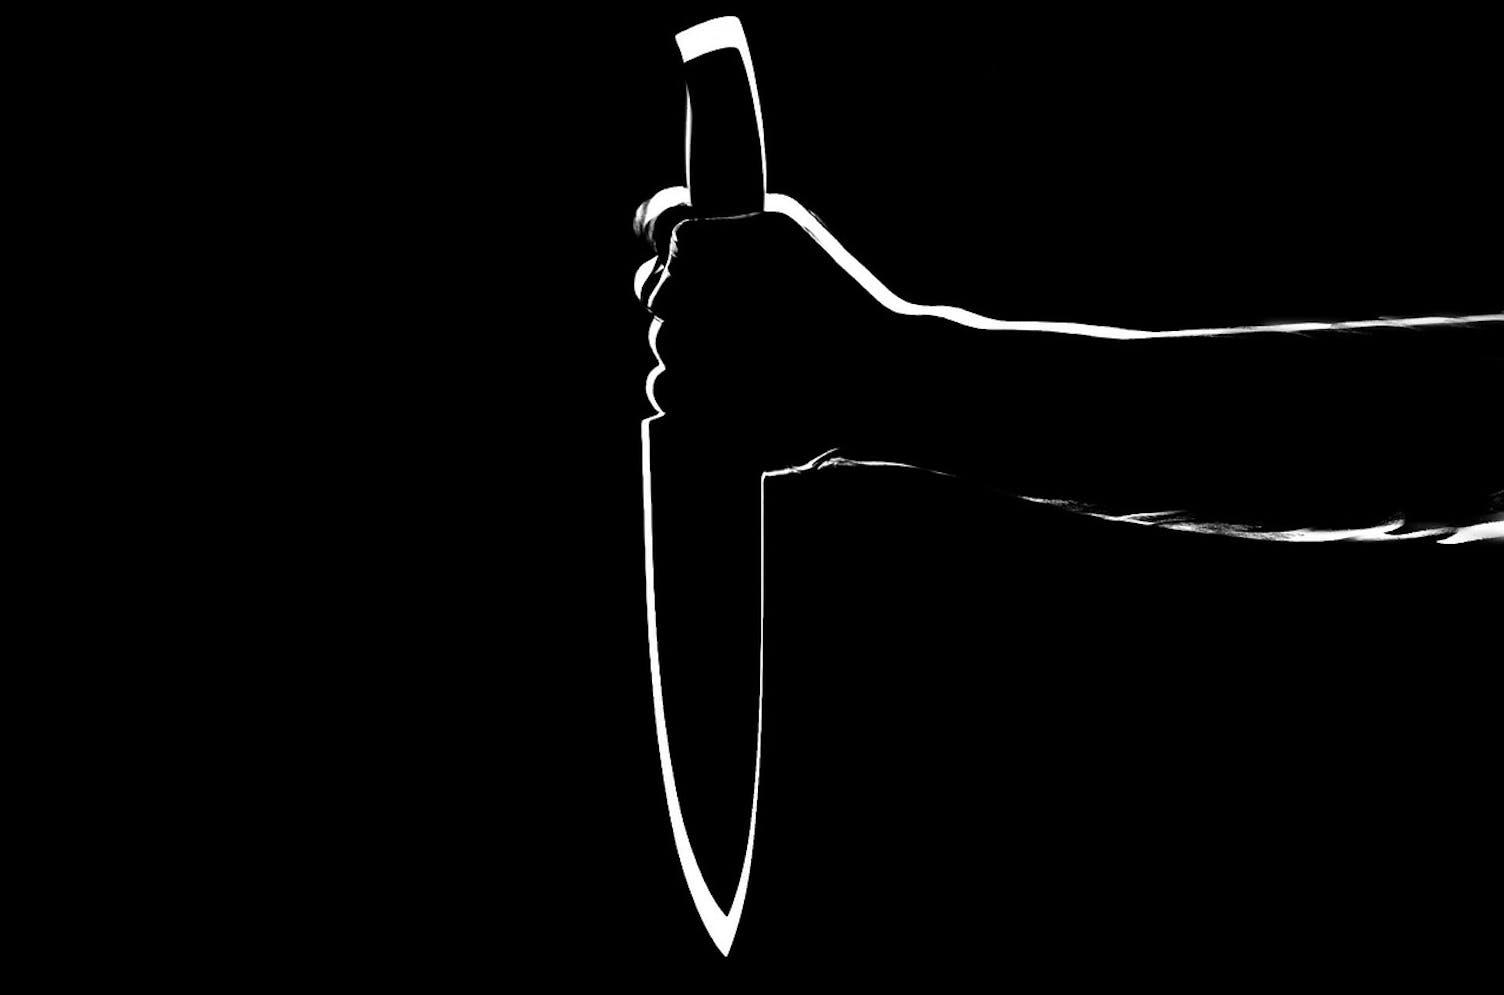 Messer Messerstecher